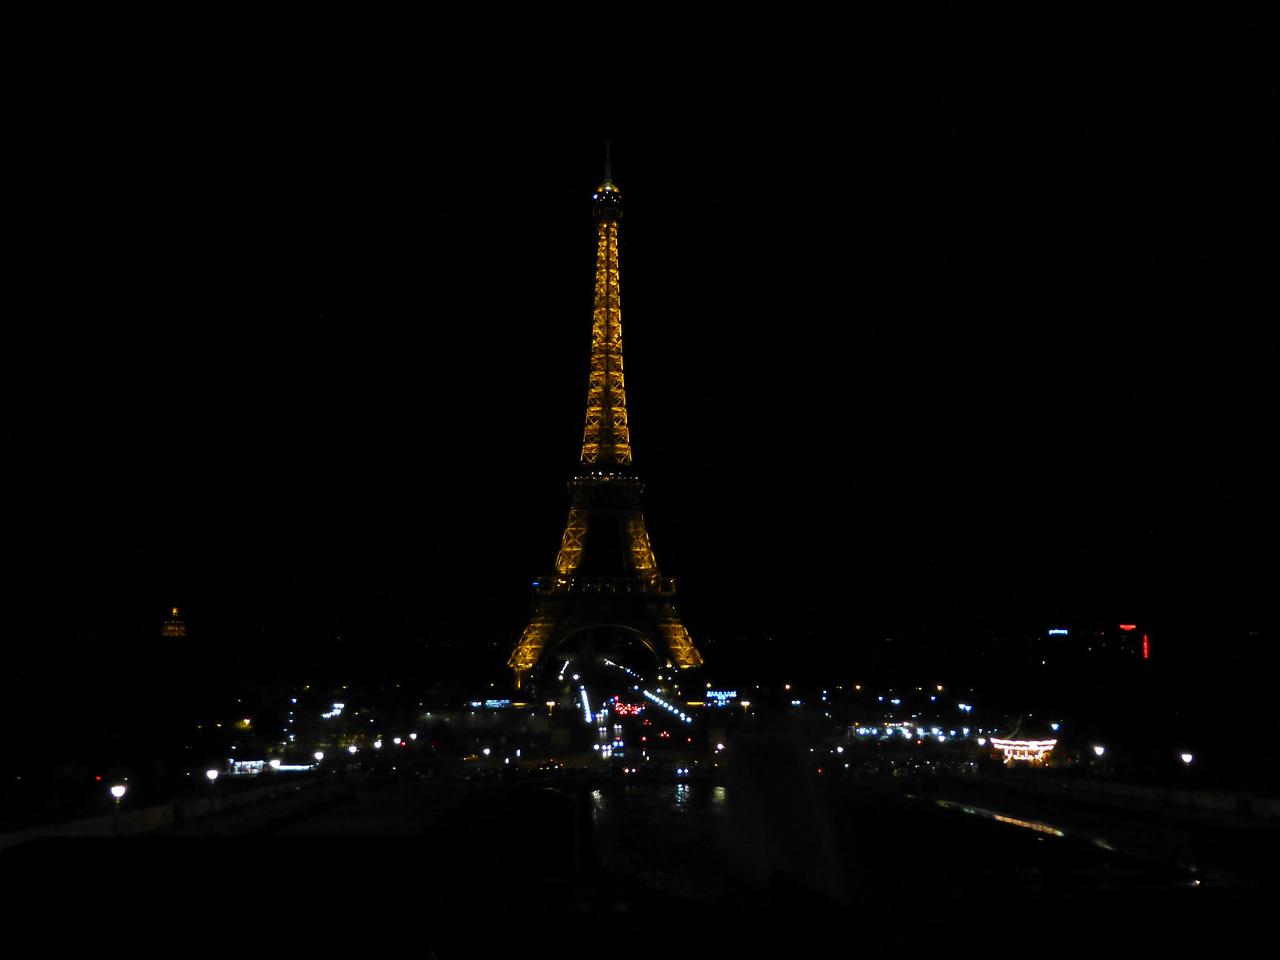 Eiffel Tower, view from Trocadéro